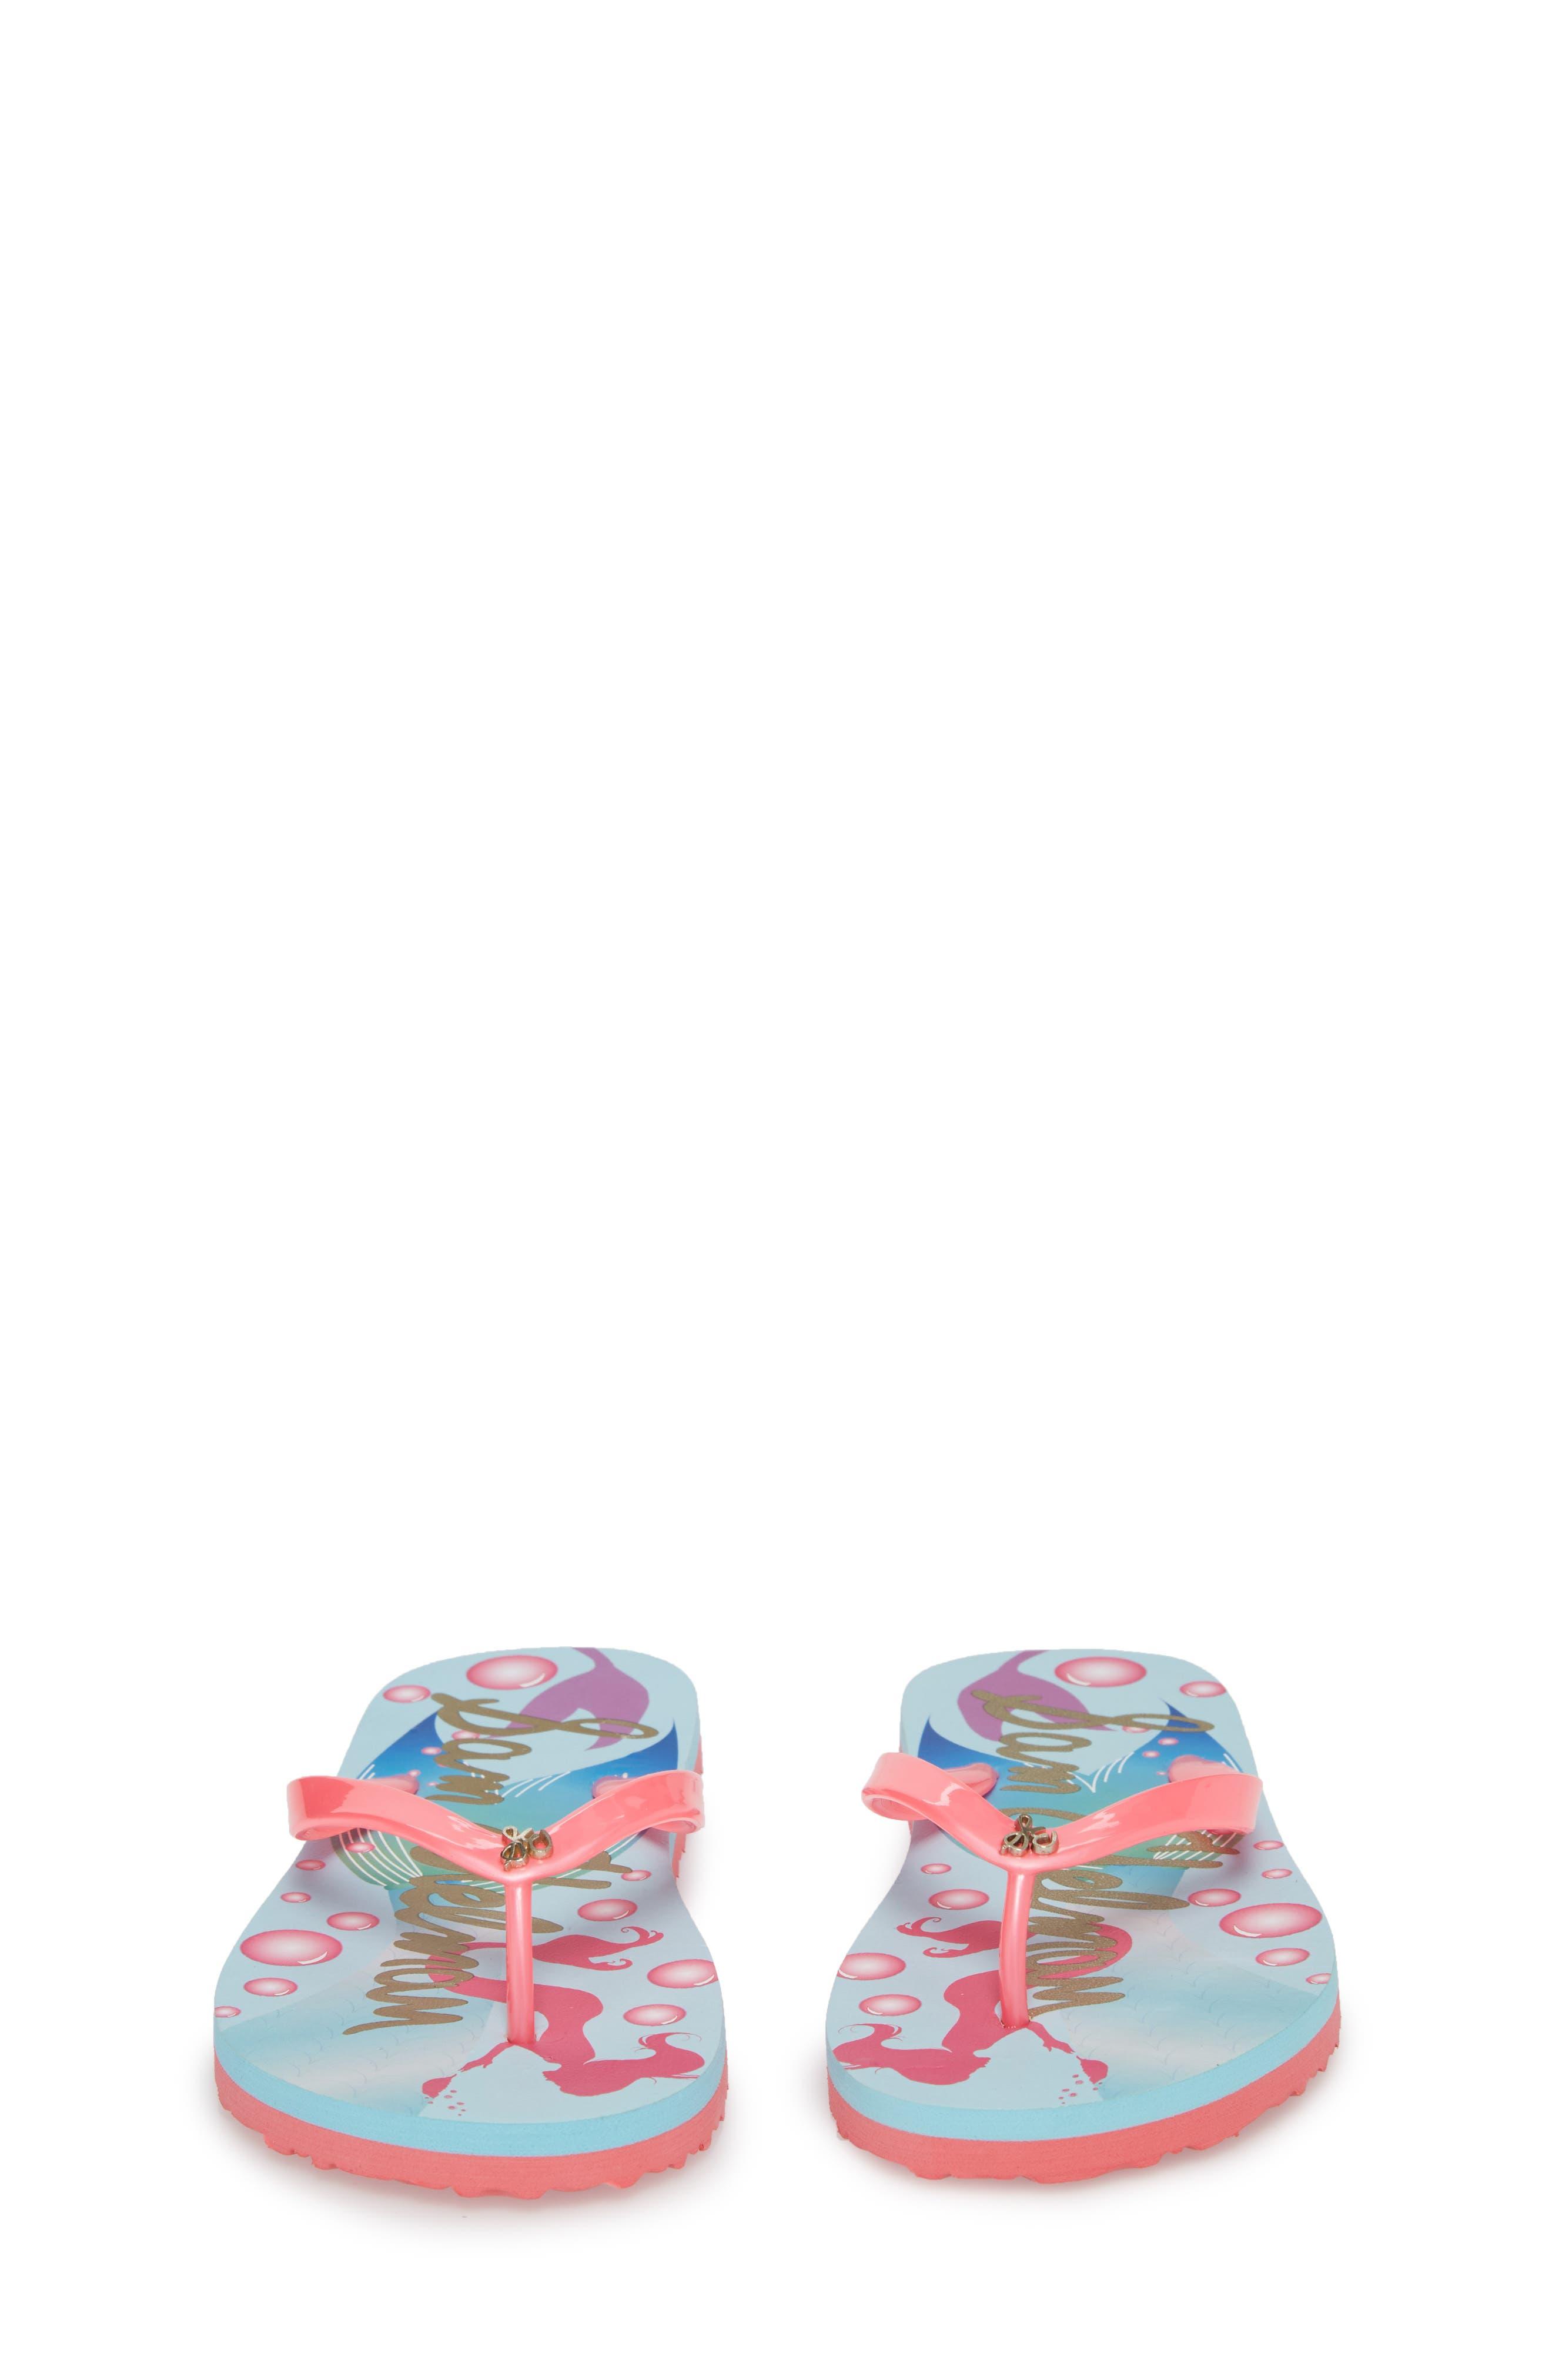 Mandy Flip Flop,                             Alternate thumbnail 5, color,                             Mermaid Turquoise/ Pink